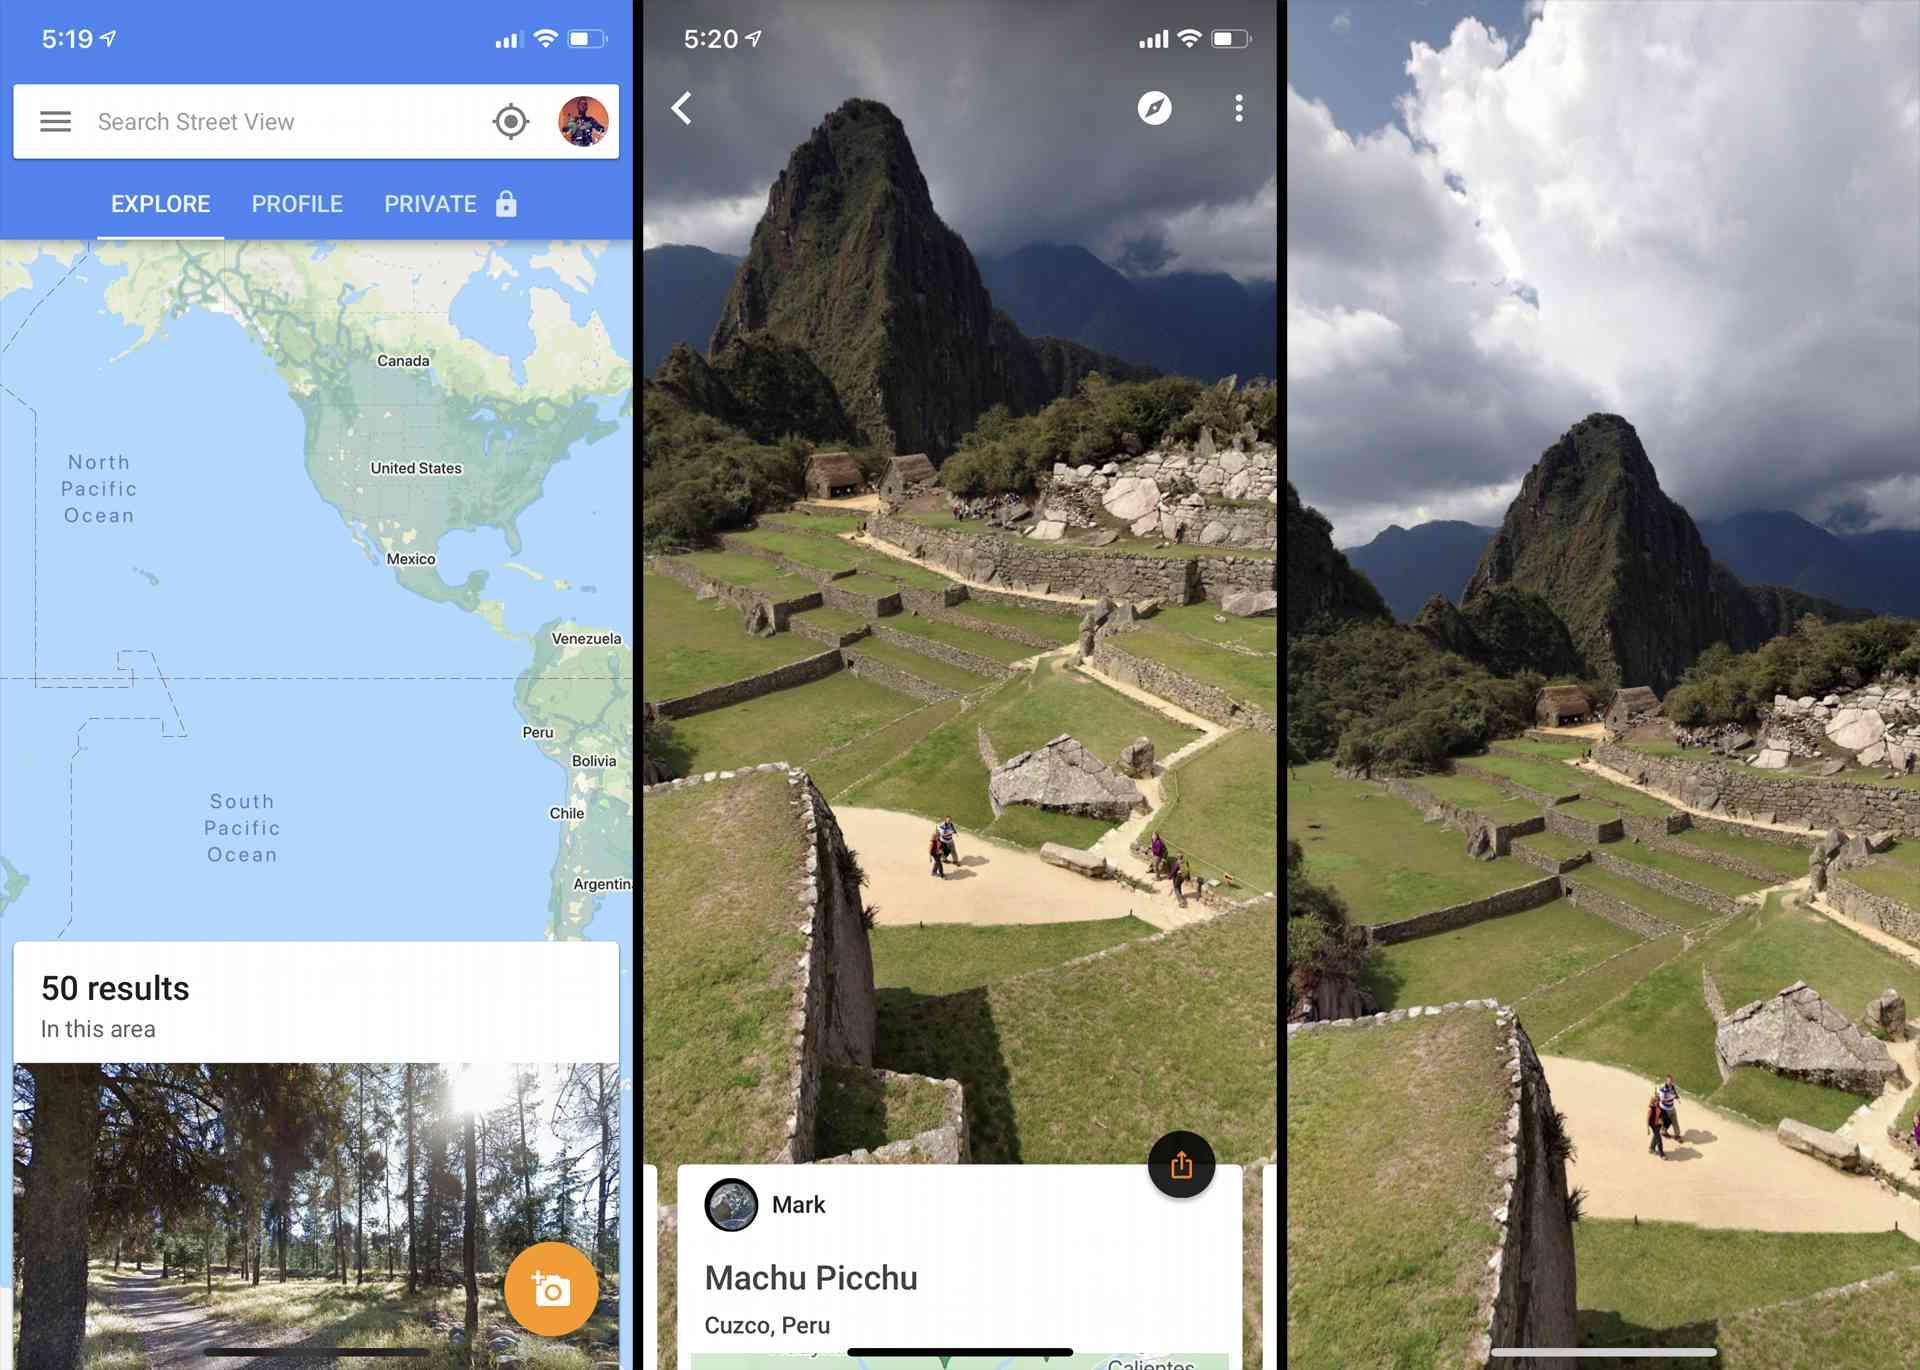 Machu Picchu as seen in Google Street View iPhone app